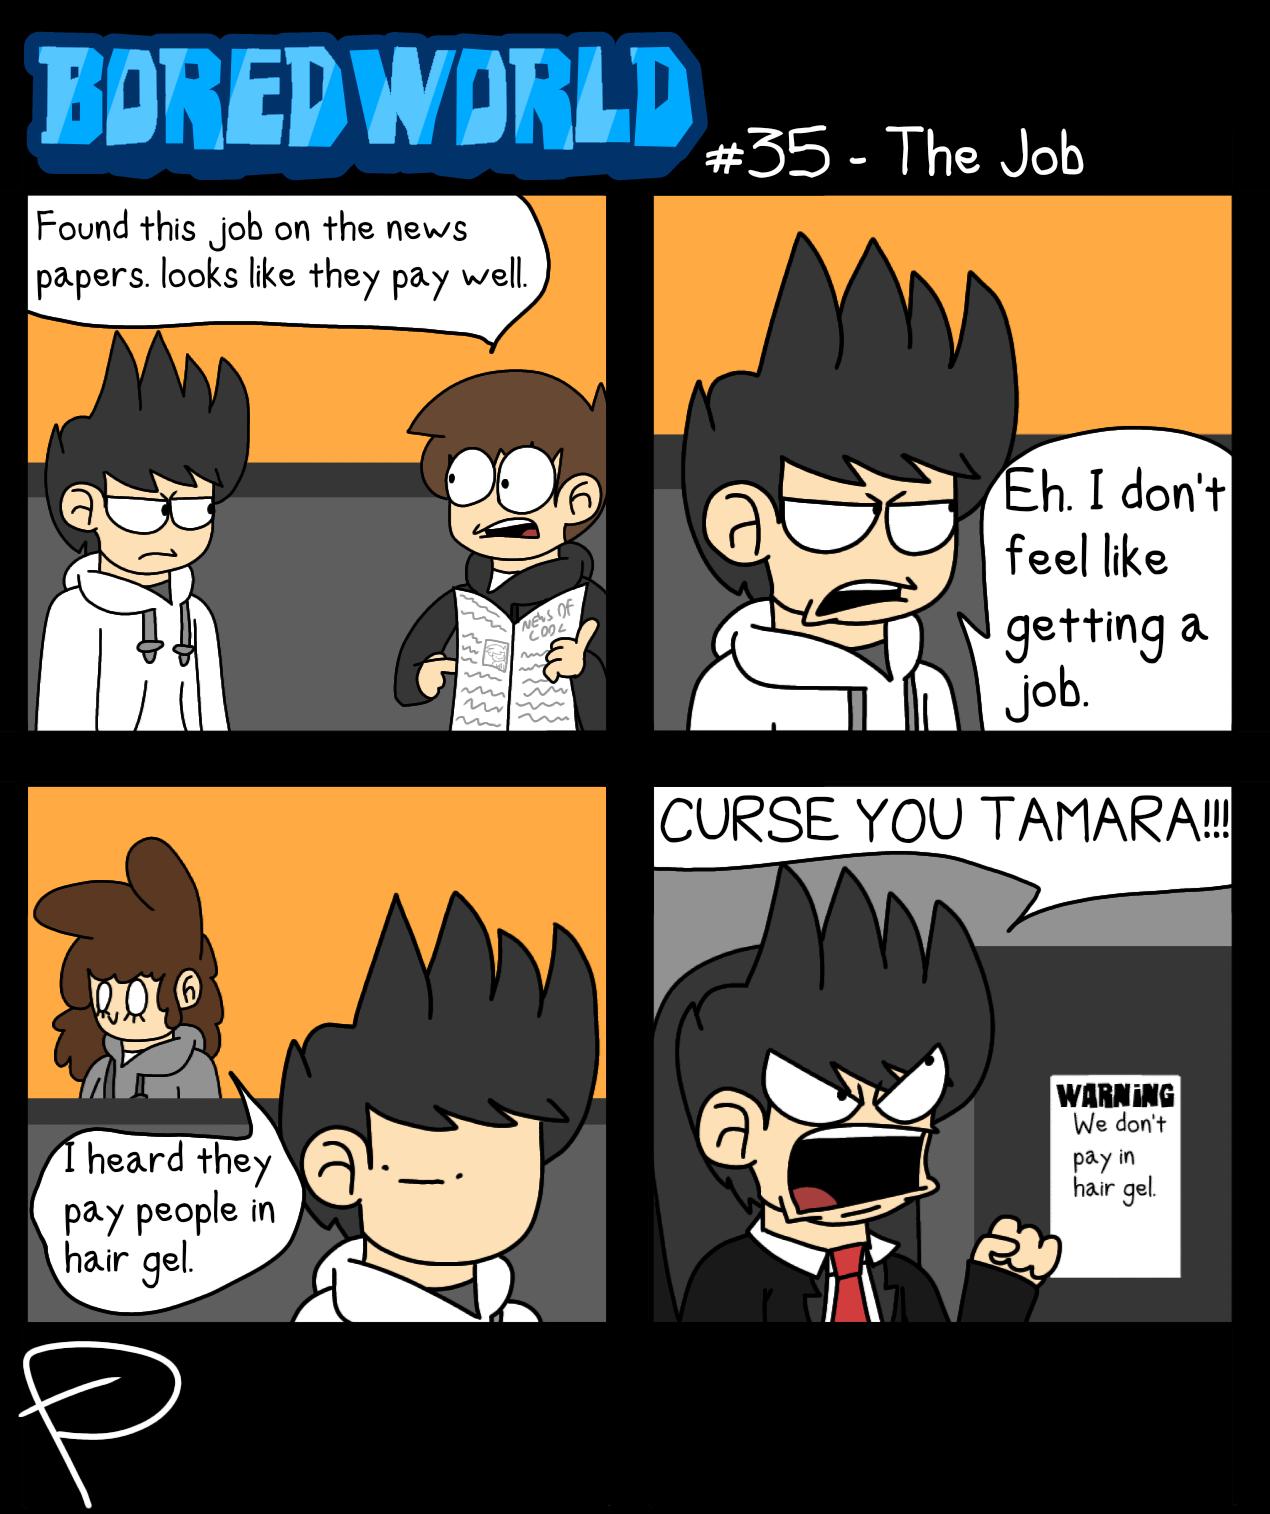 Boredworld - The Job